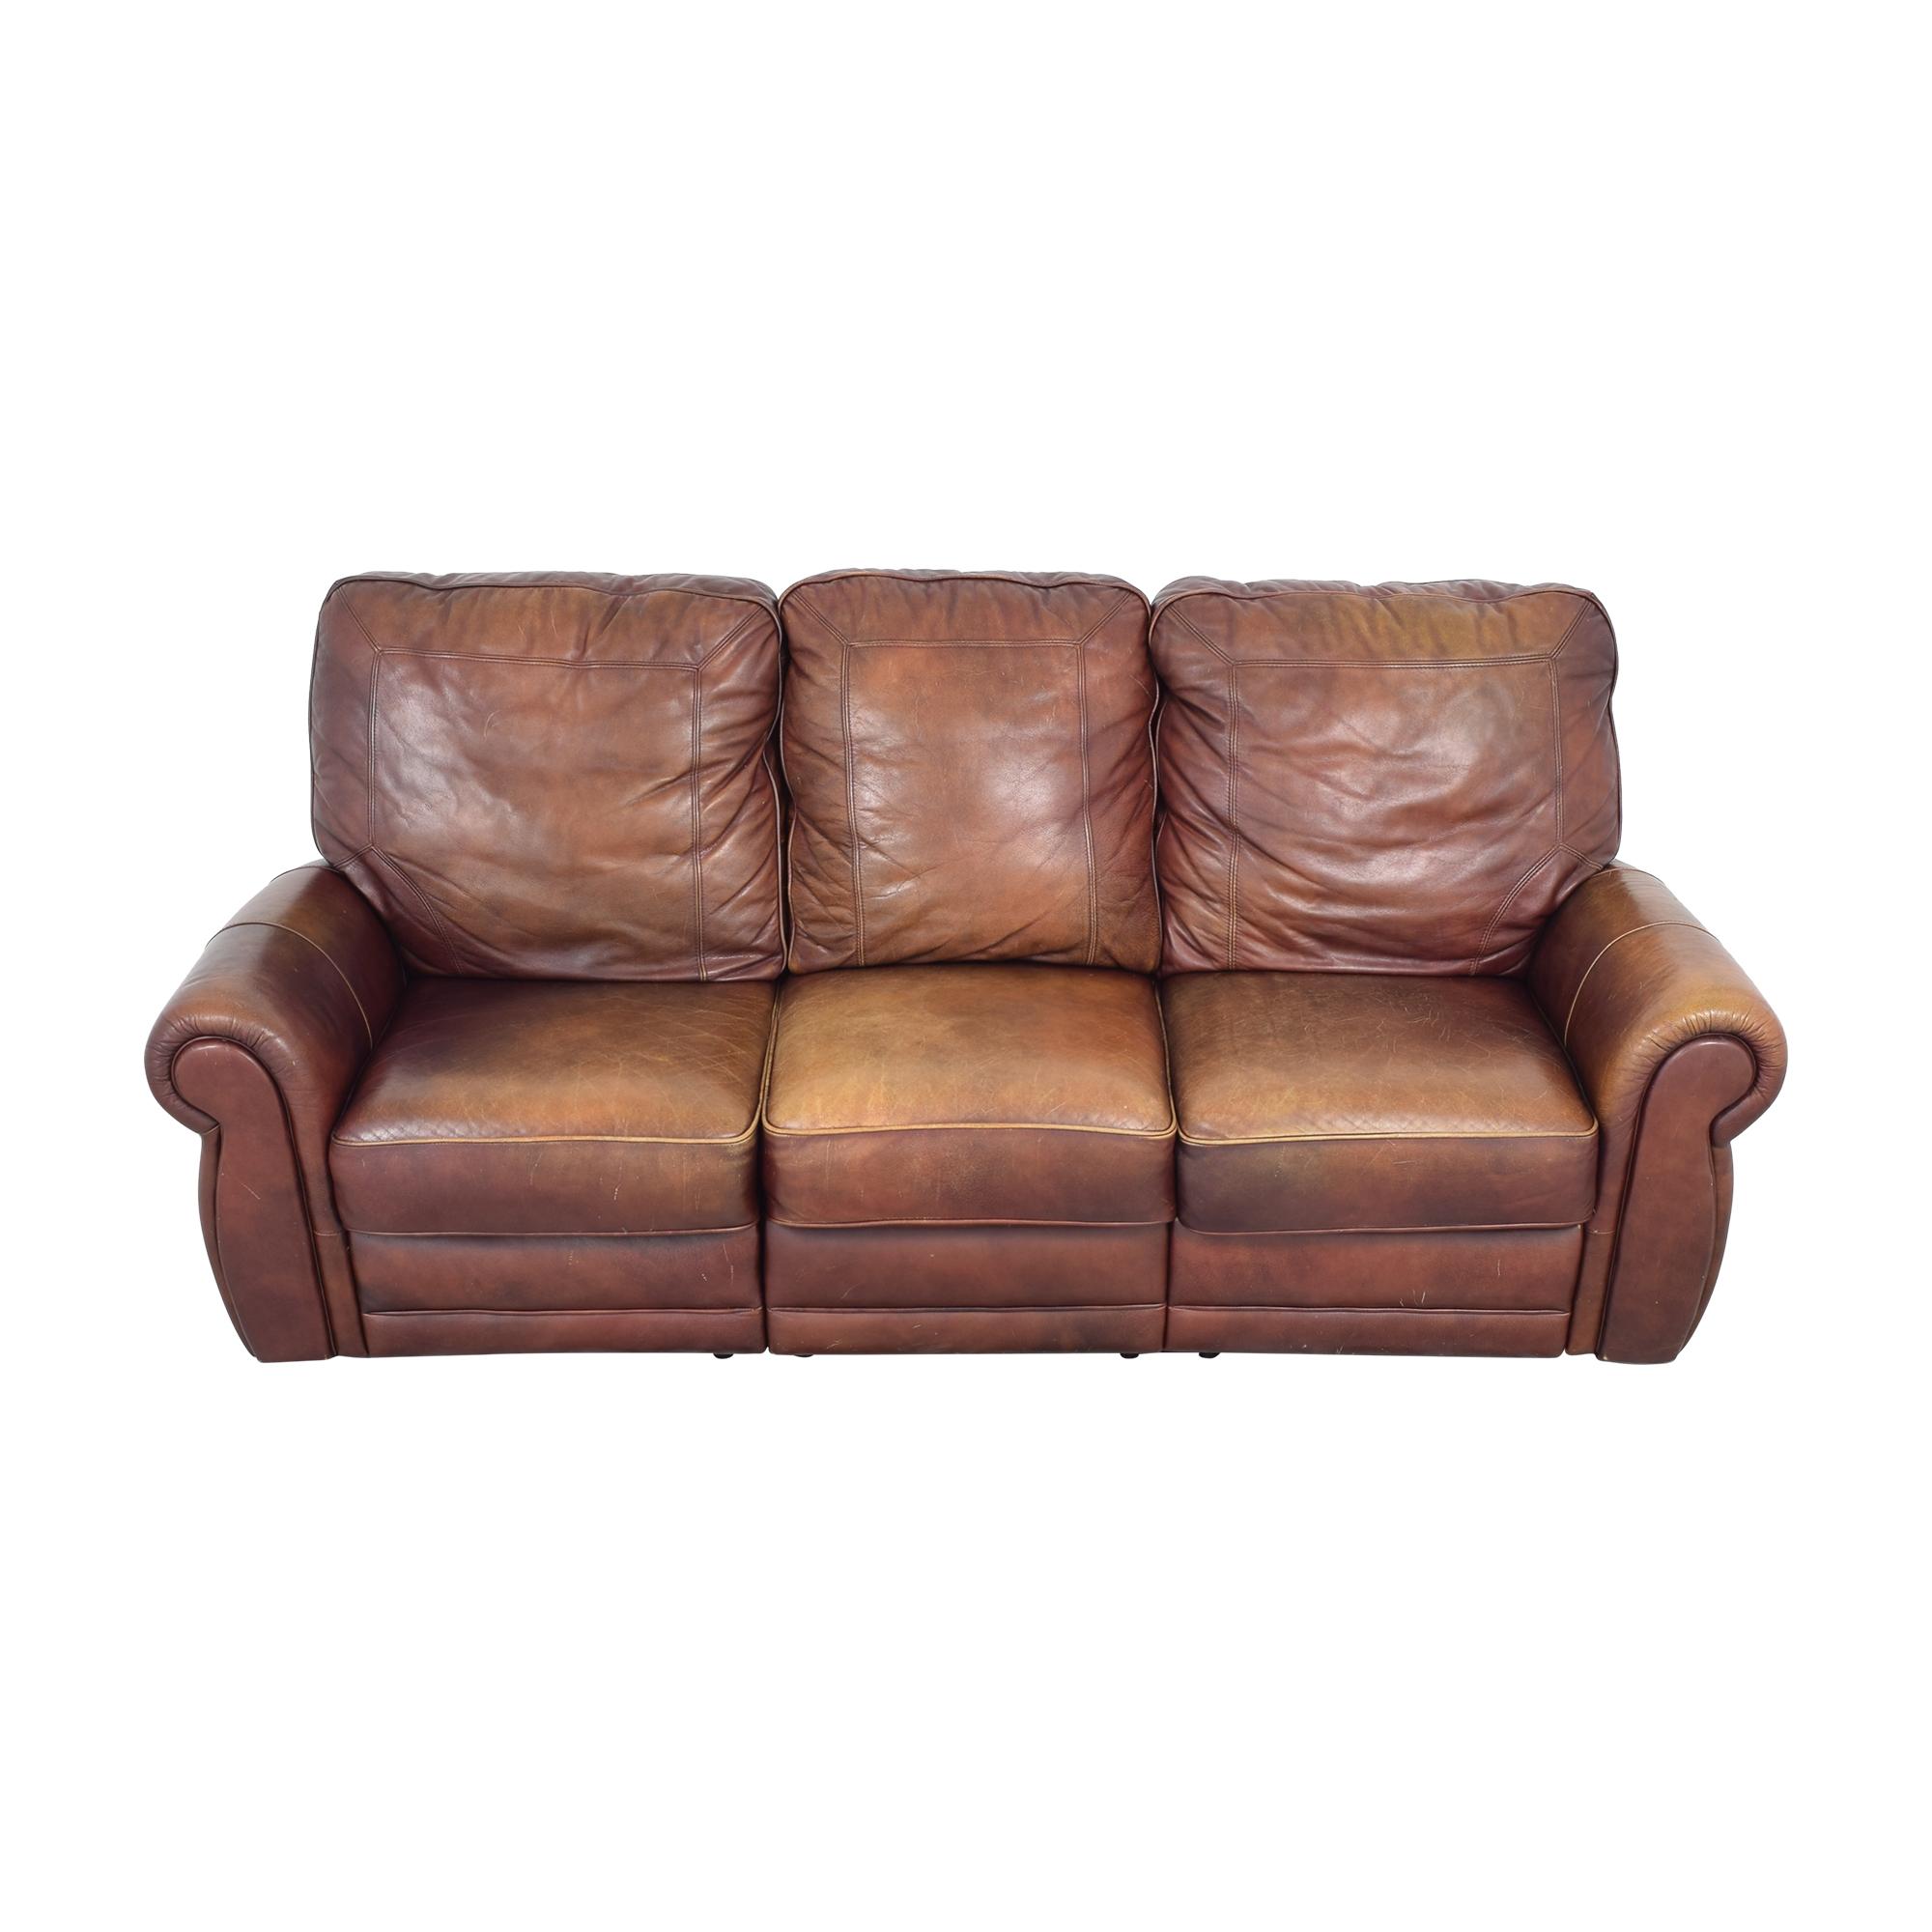 Three Cushion Reclining Sofa / Sofas